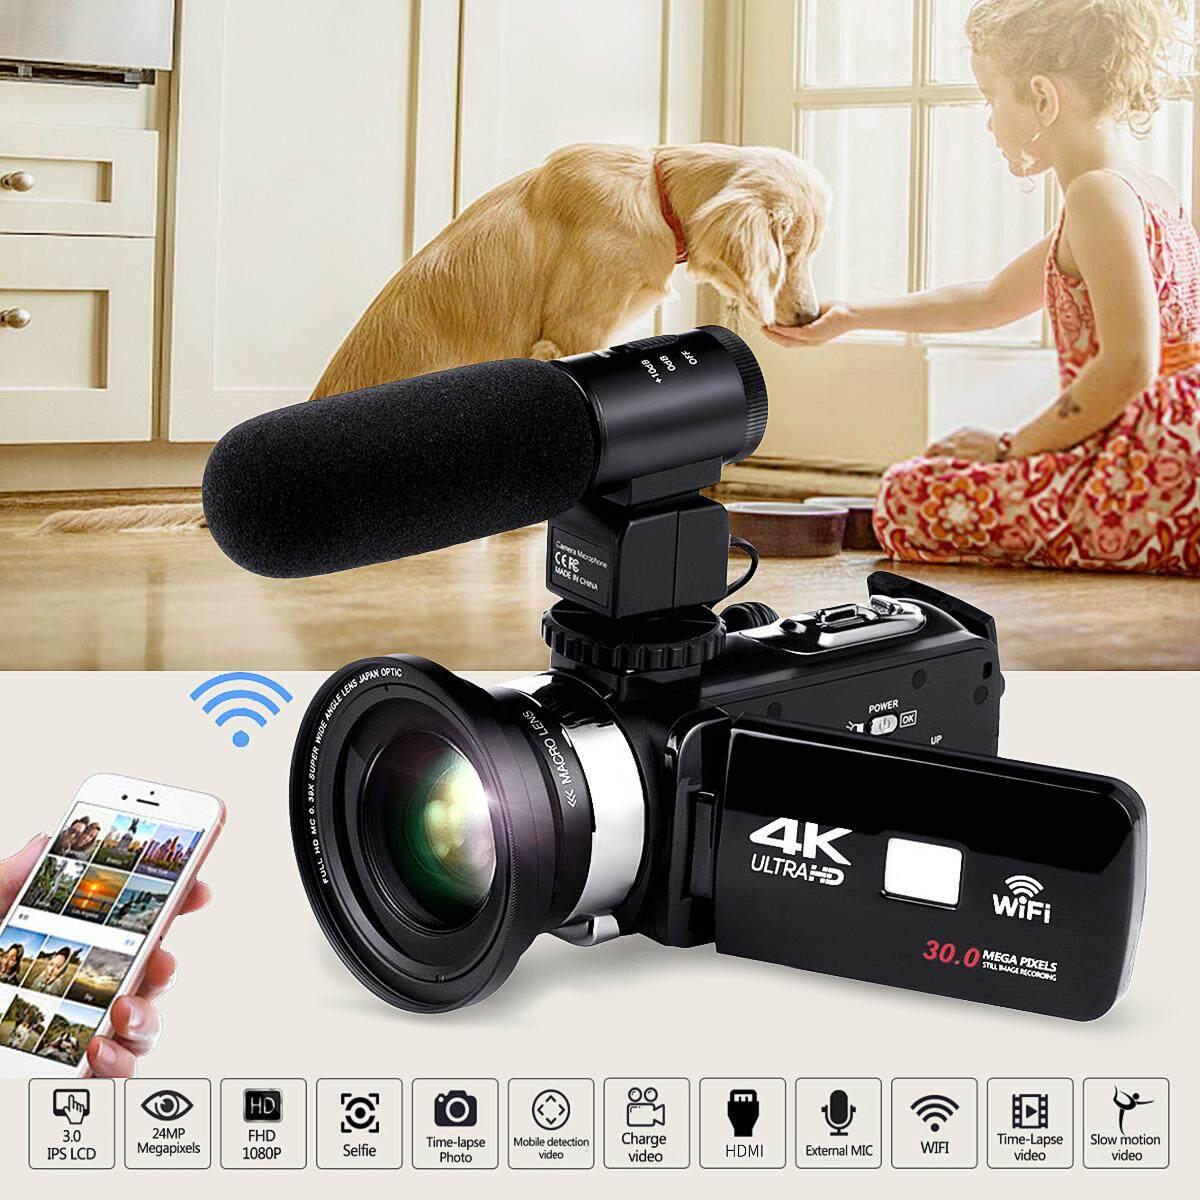 Full Hd Wifi 1080p 4k 16x Zoom Digital Video Camera Dv Camcorder & Lens& Microphone By Audew.